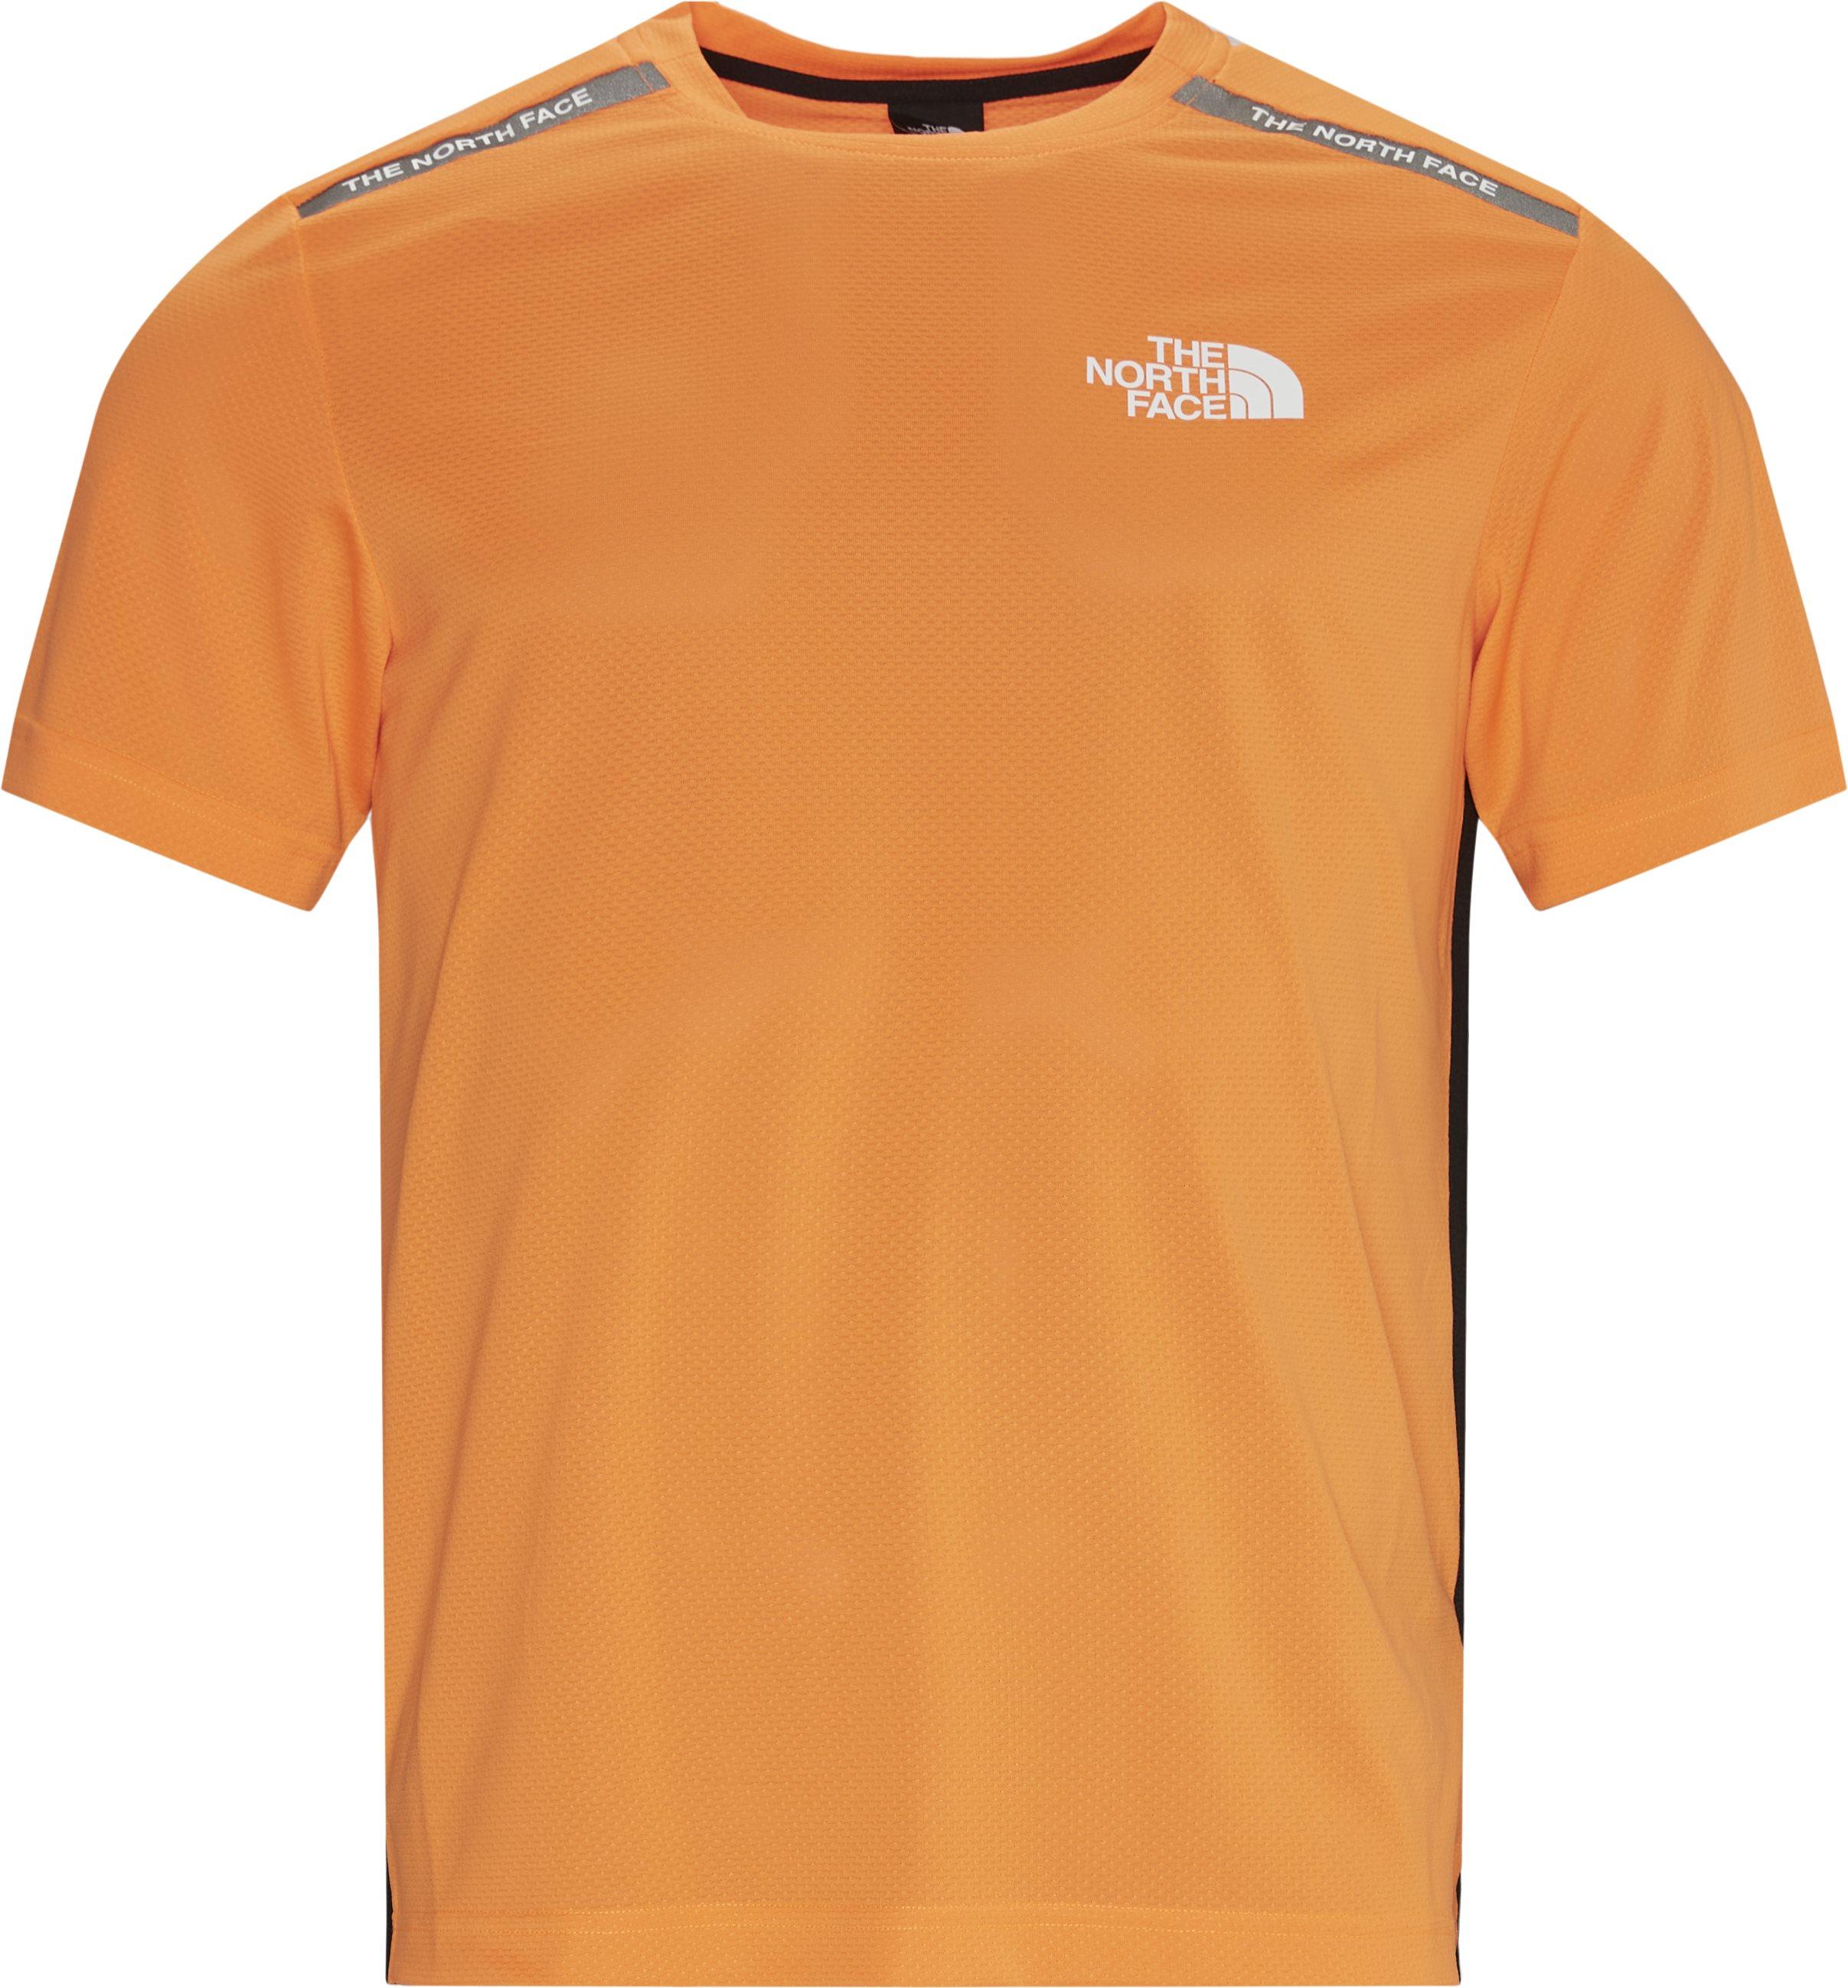 Eu Tee - T-shirts - Regular - Orange